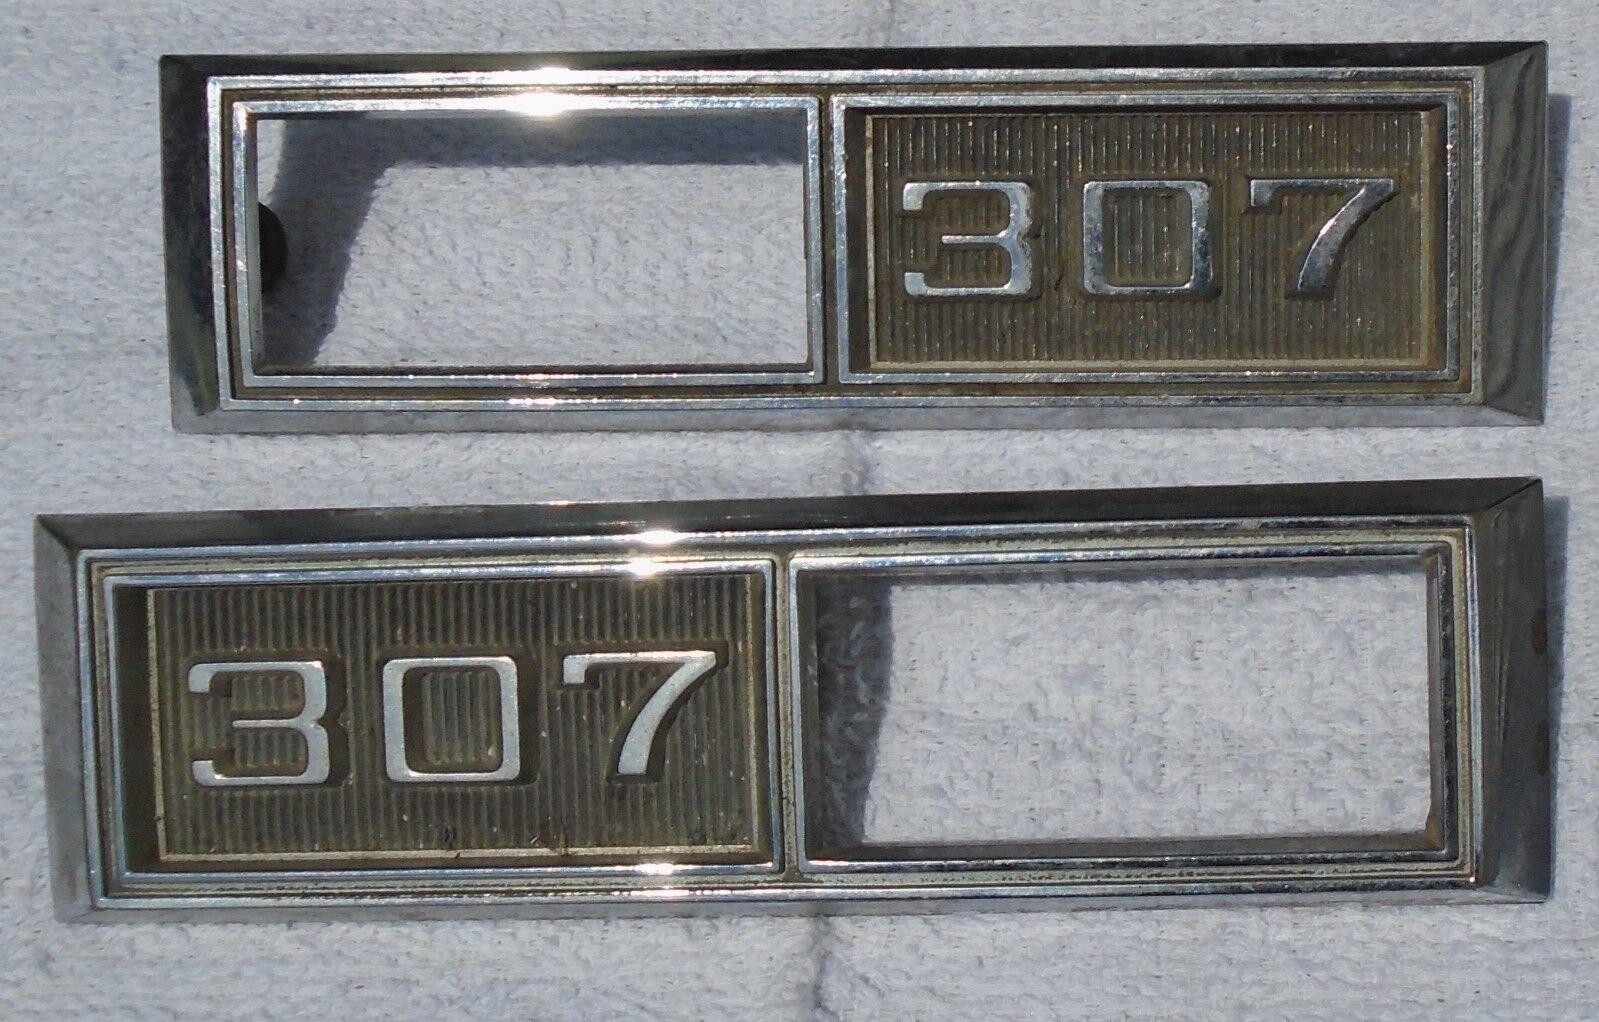 PAIR 1968 CHEVROLET CHEVY IMPALA 307 SIDE MARKER LIGHT EMBLEMS OEM 3920874 9993